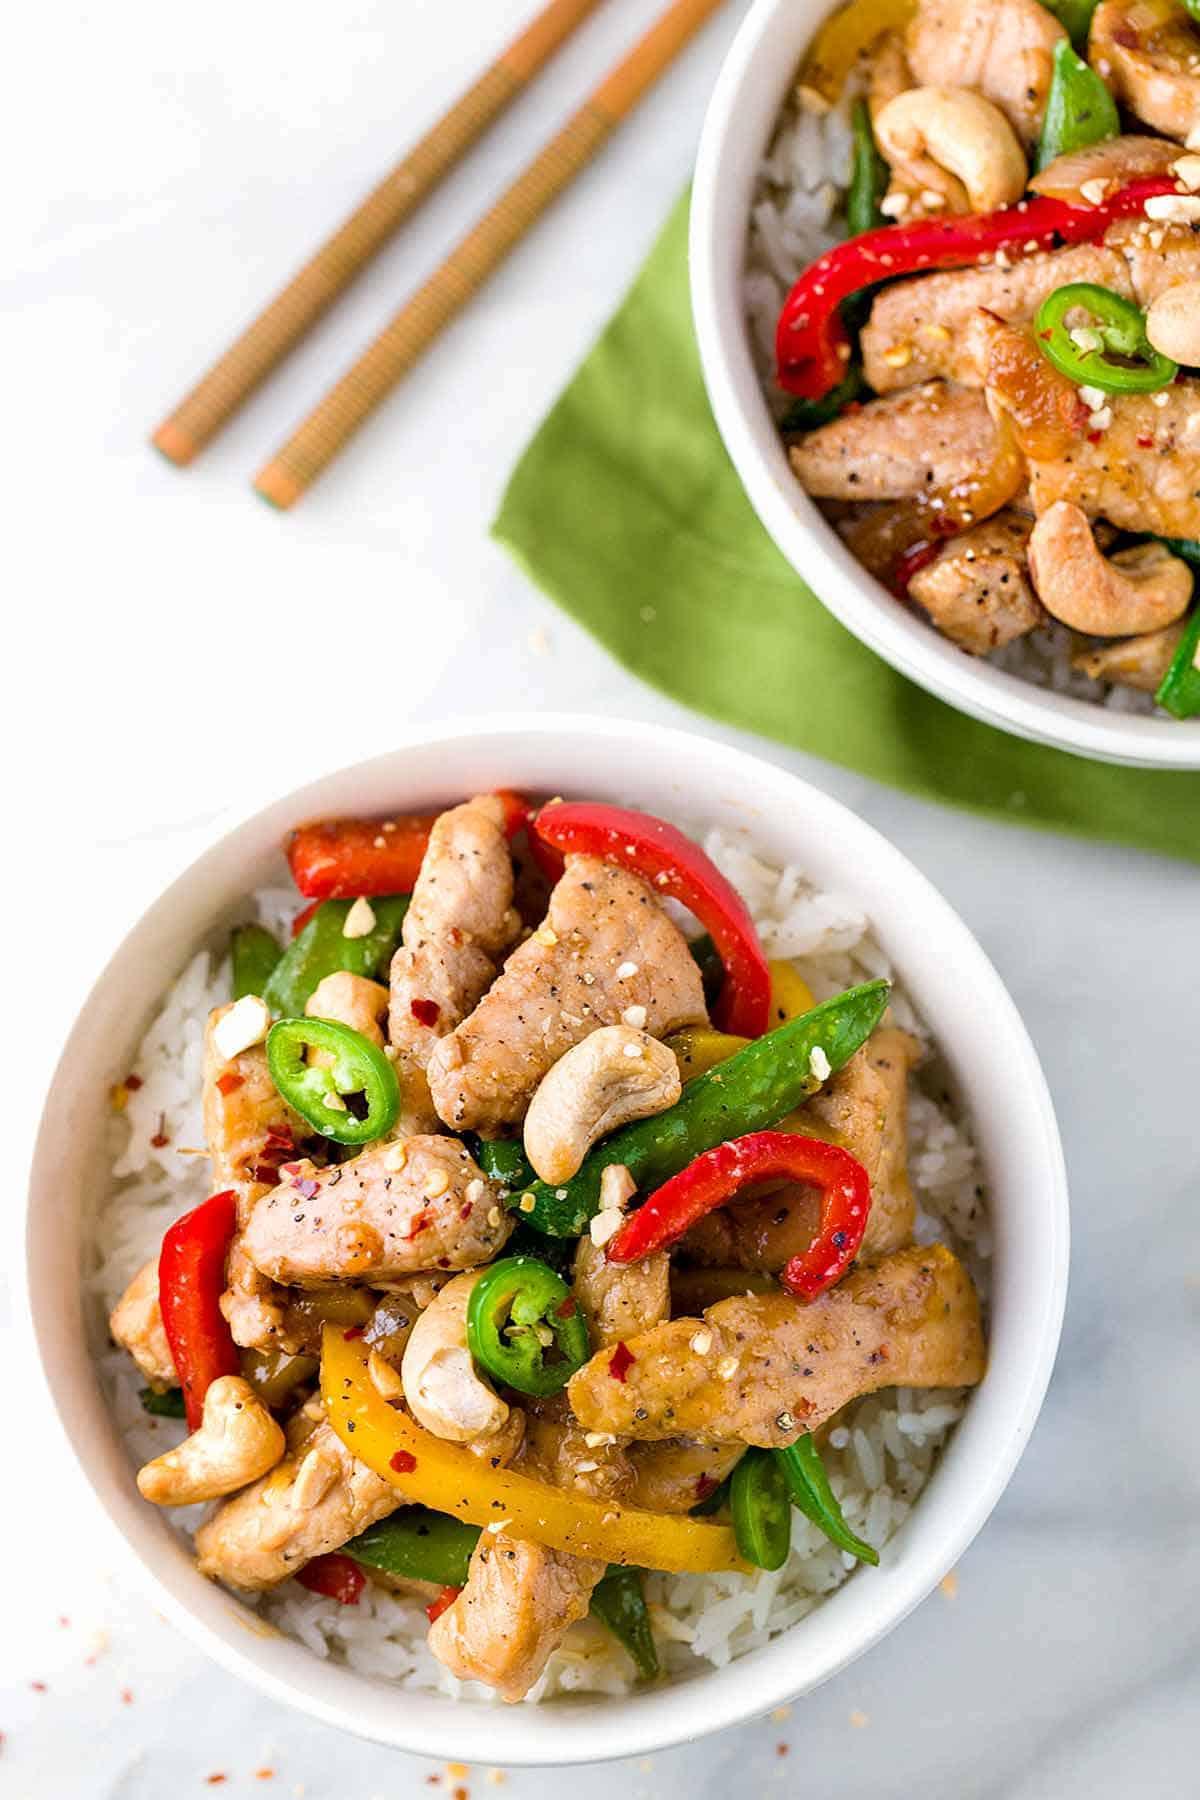 Pork Stir-Fry with Sugar Snap Peas